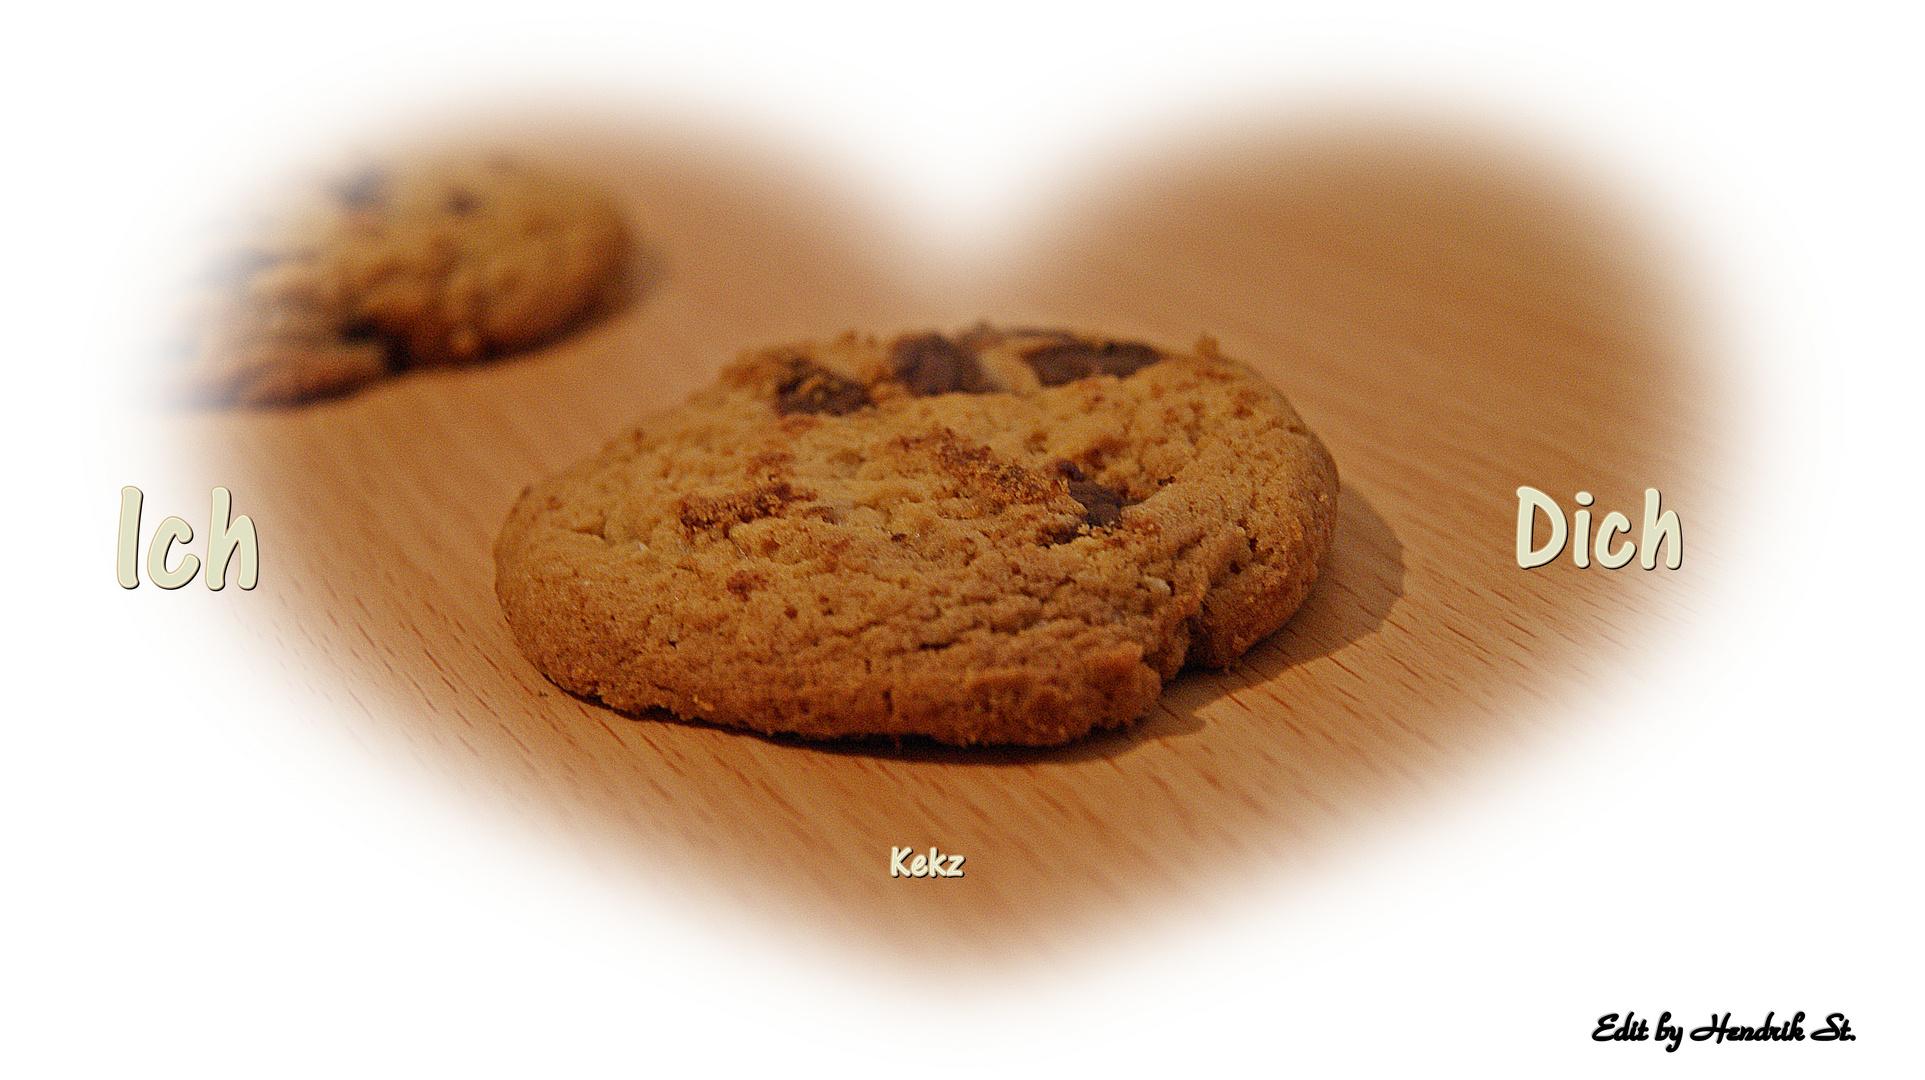 Ich kekz Dich